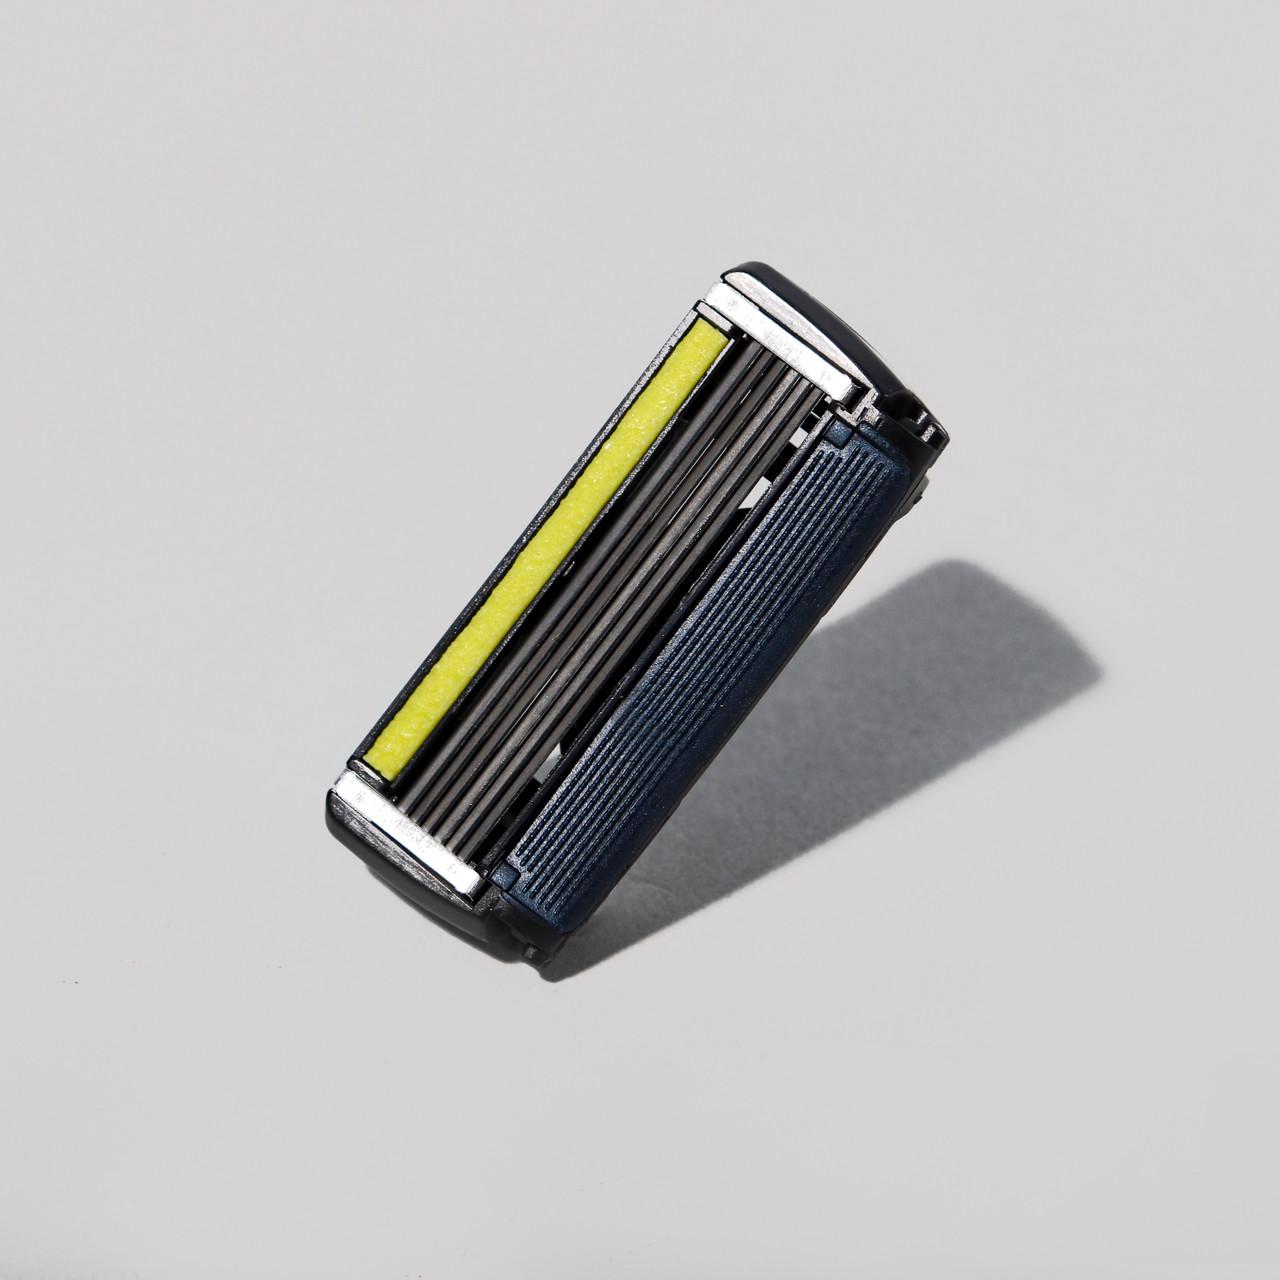 Premium 6-Blade Razor Refills (No Handle)